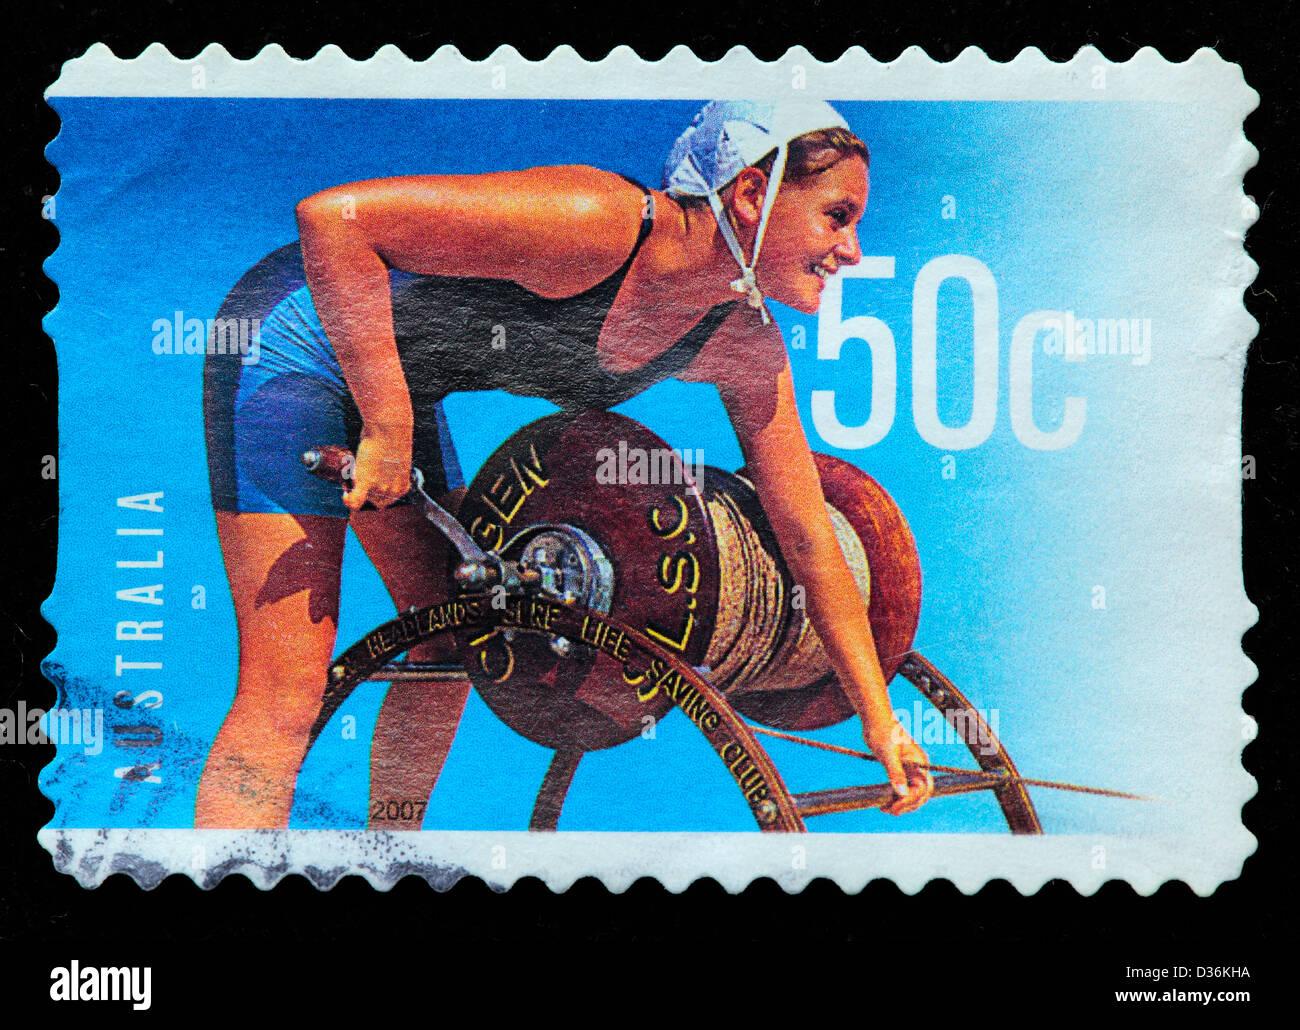 Surf Life Saving, postage stamp, Australia, 2007 - Stock Image